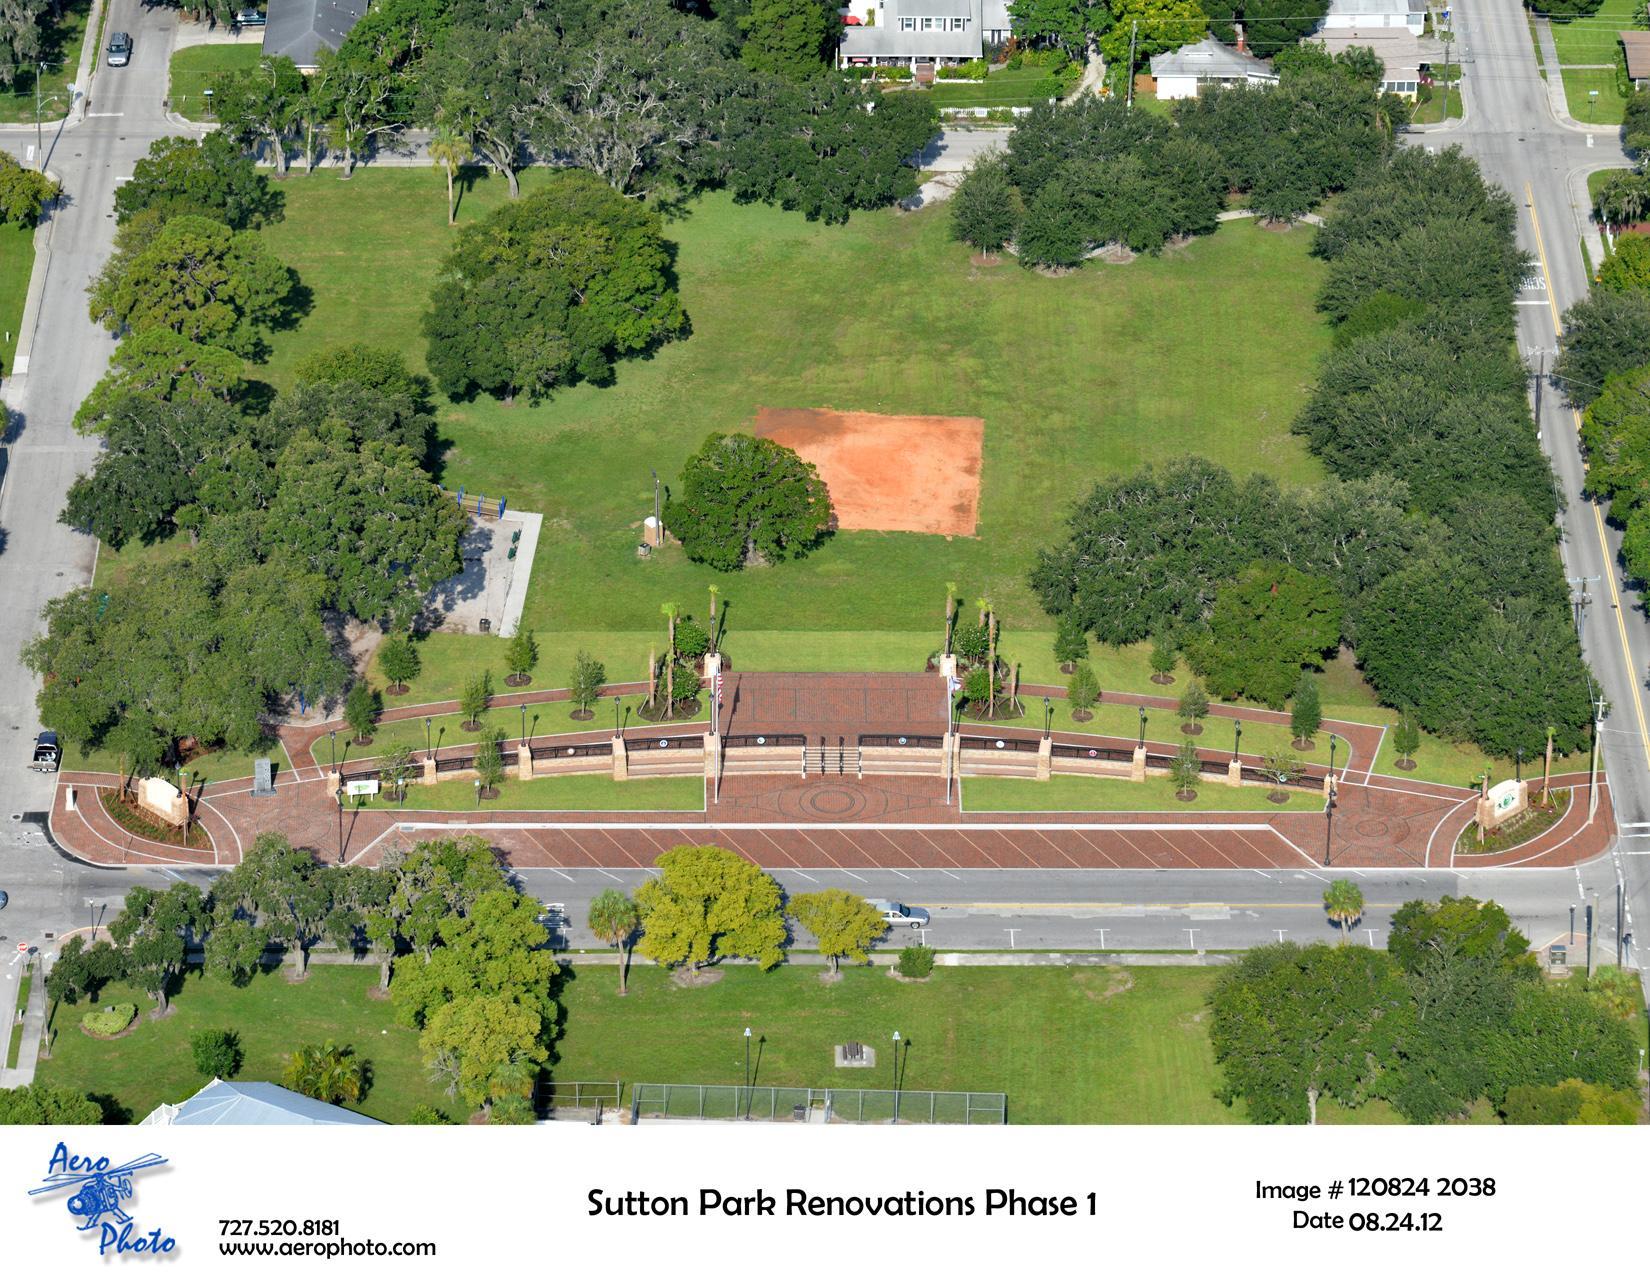 PHB - Sutton Park 9